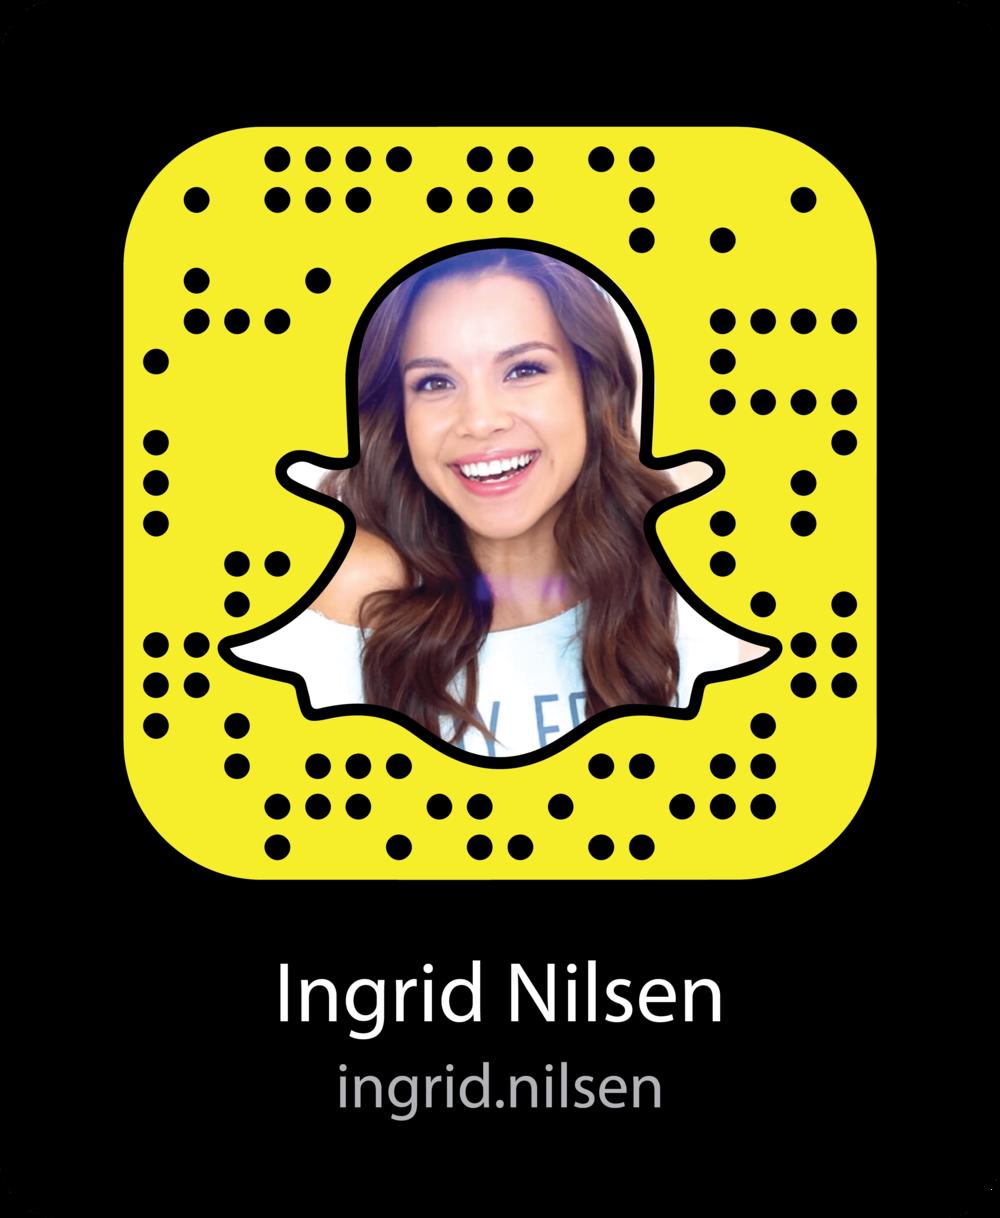 ingrid-nilsen-celebrity-snapchat-snapcode